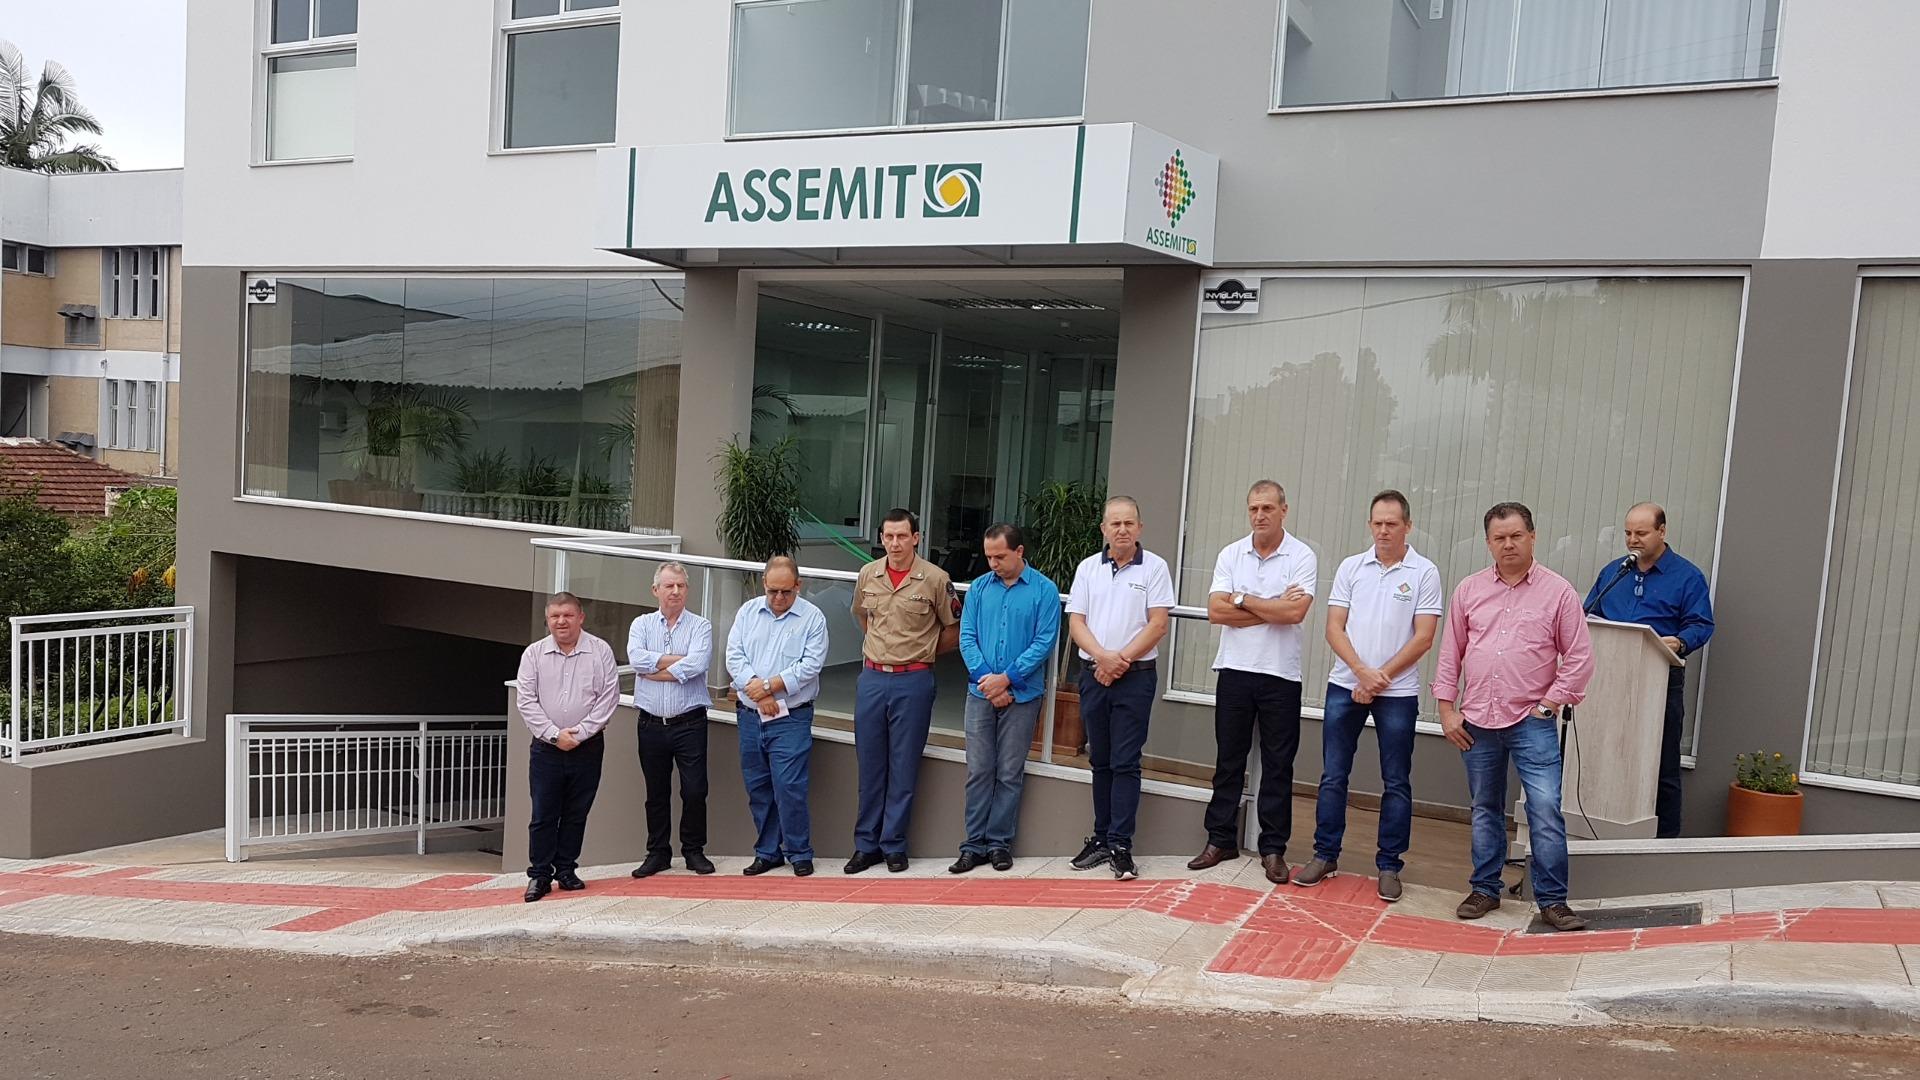 Assemit de Itapiranga inaugura nova sede